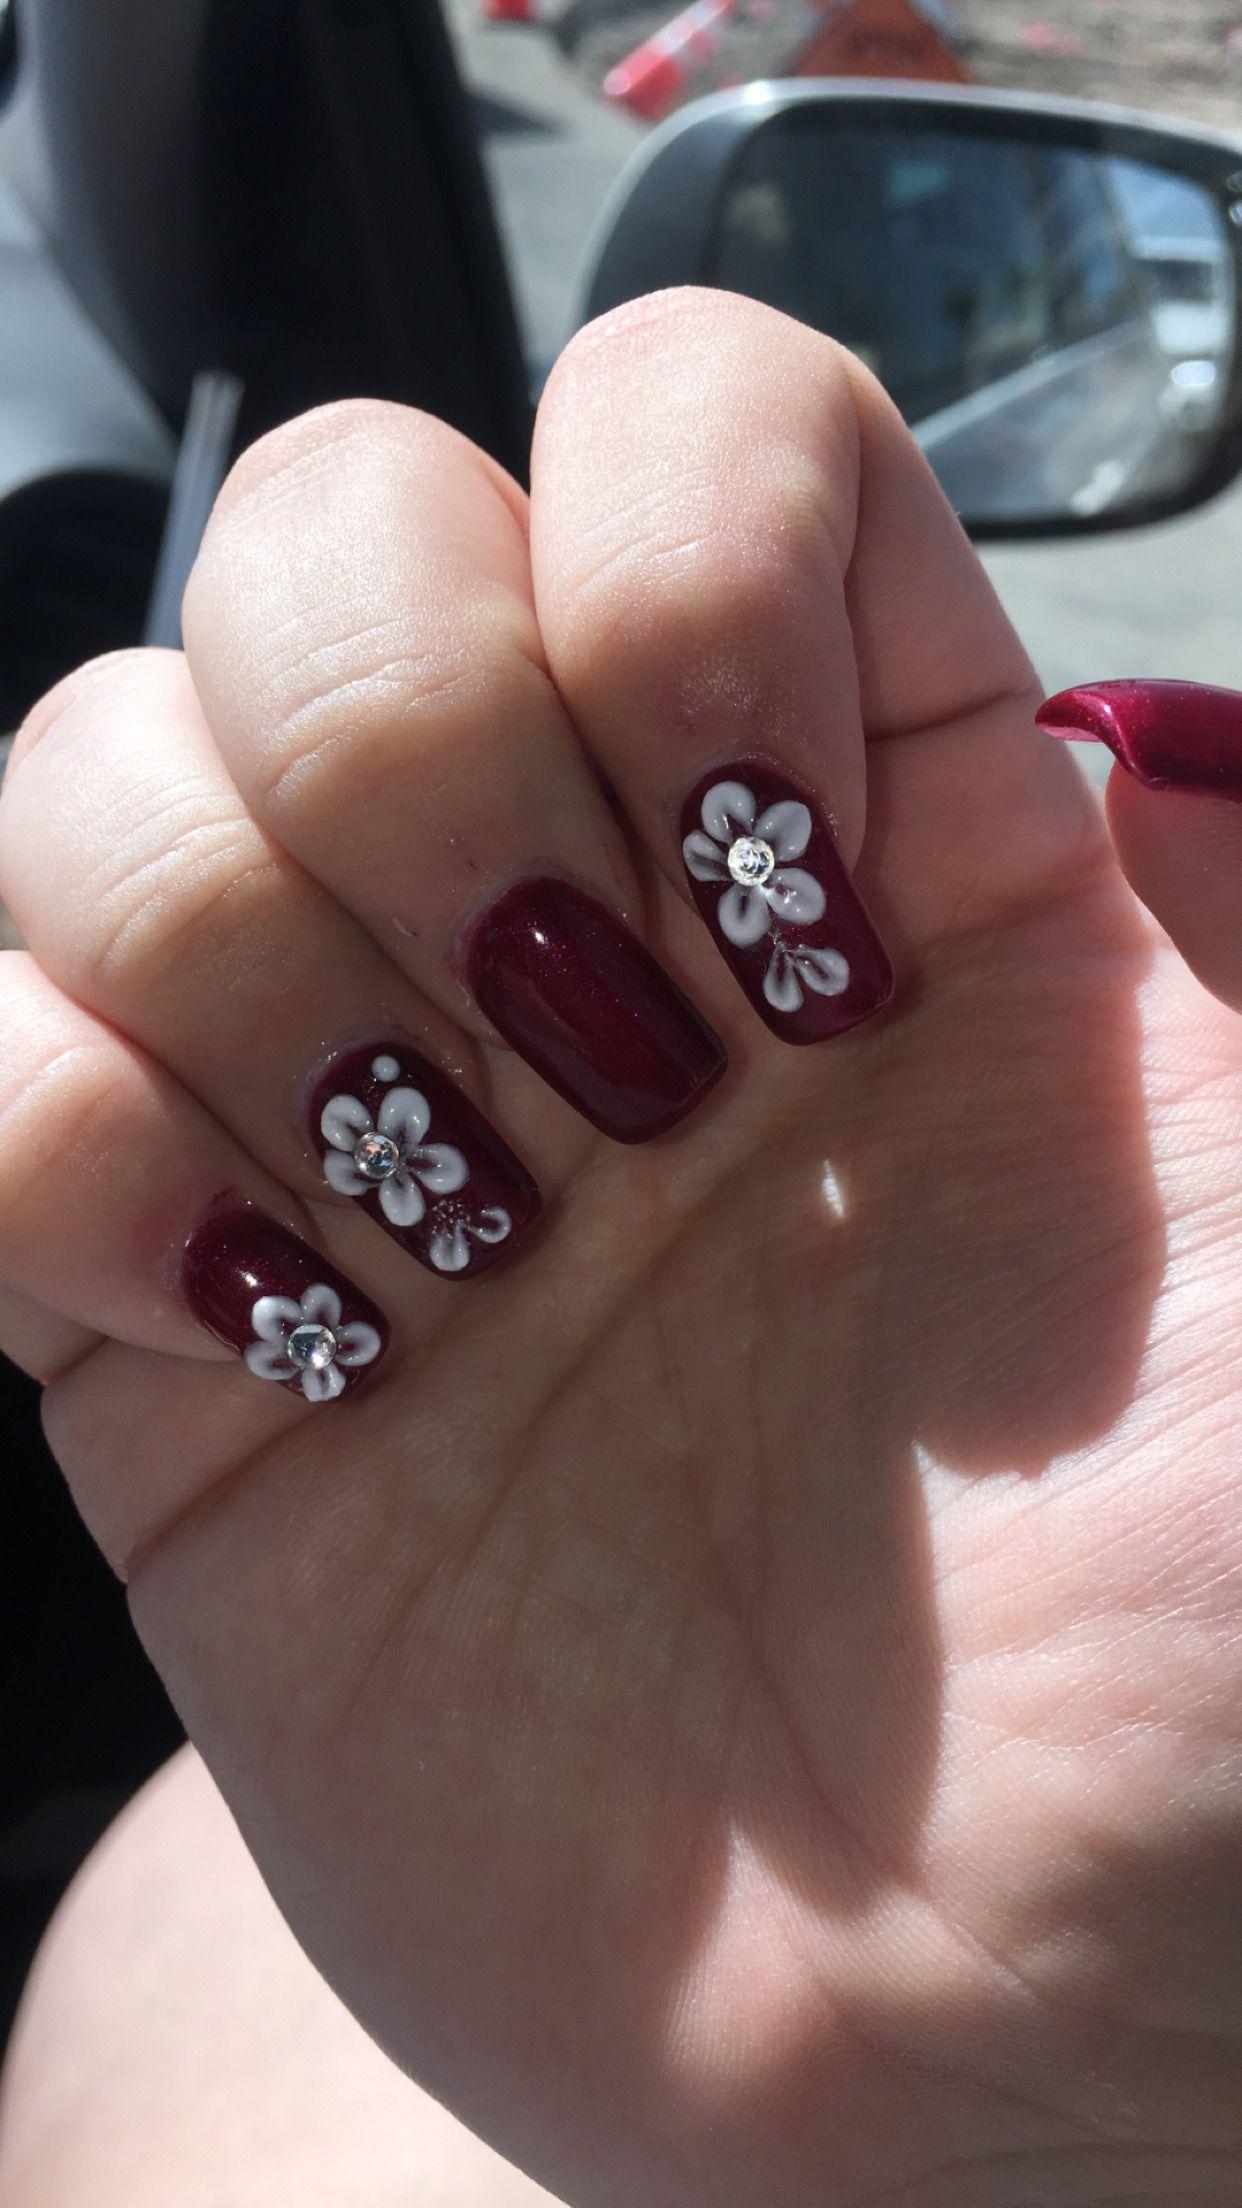 Burgundy wedding nails | Wedding nails, Nails, Burgundy ...